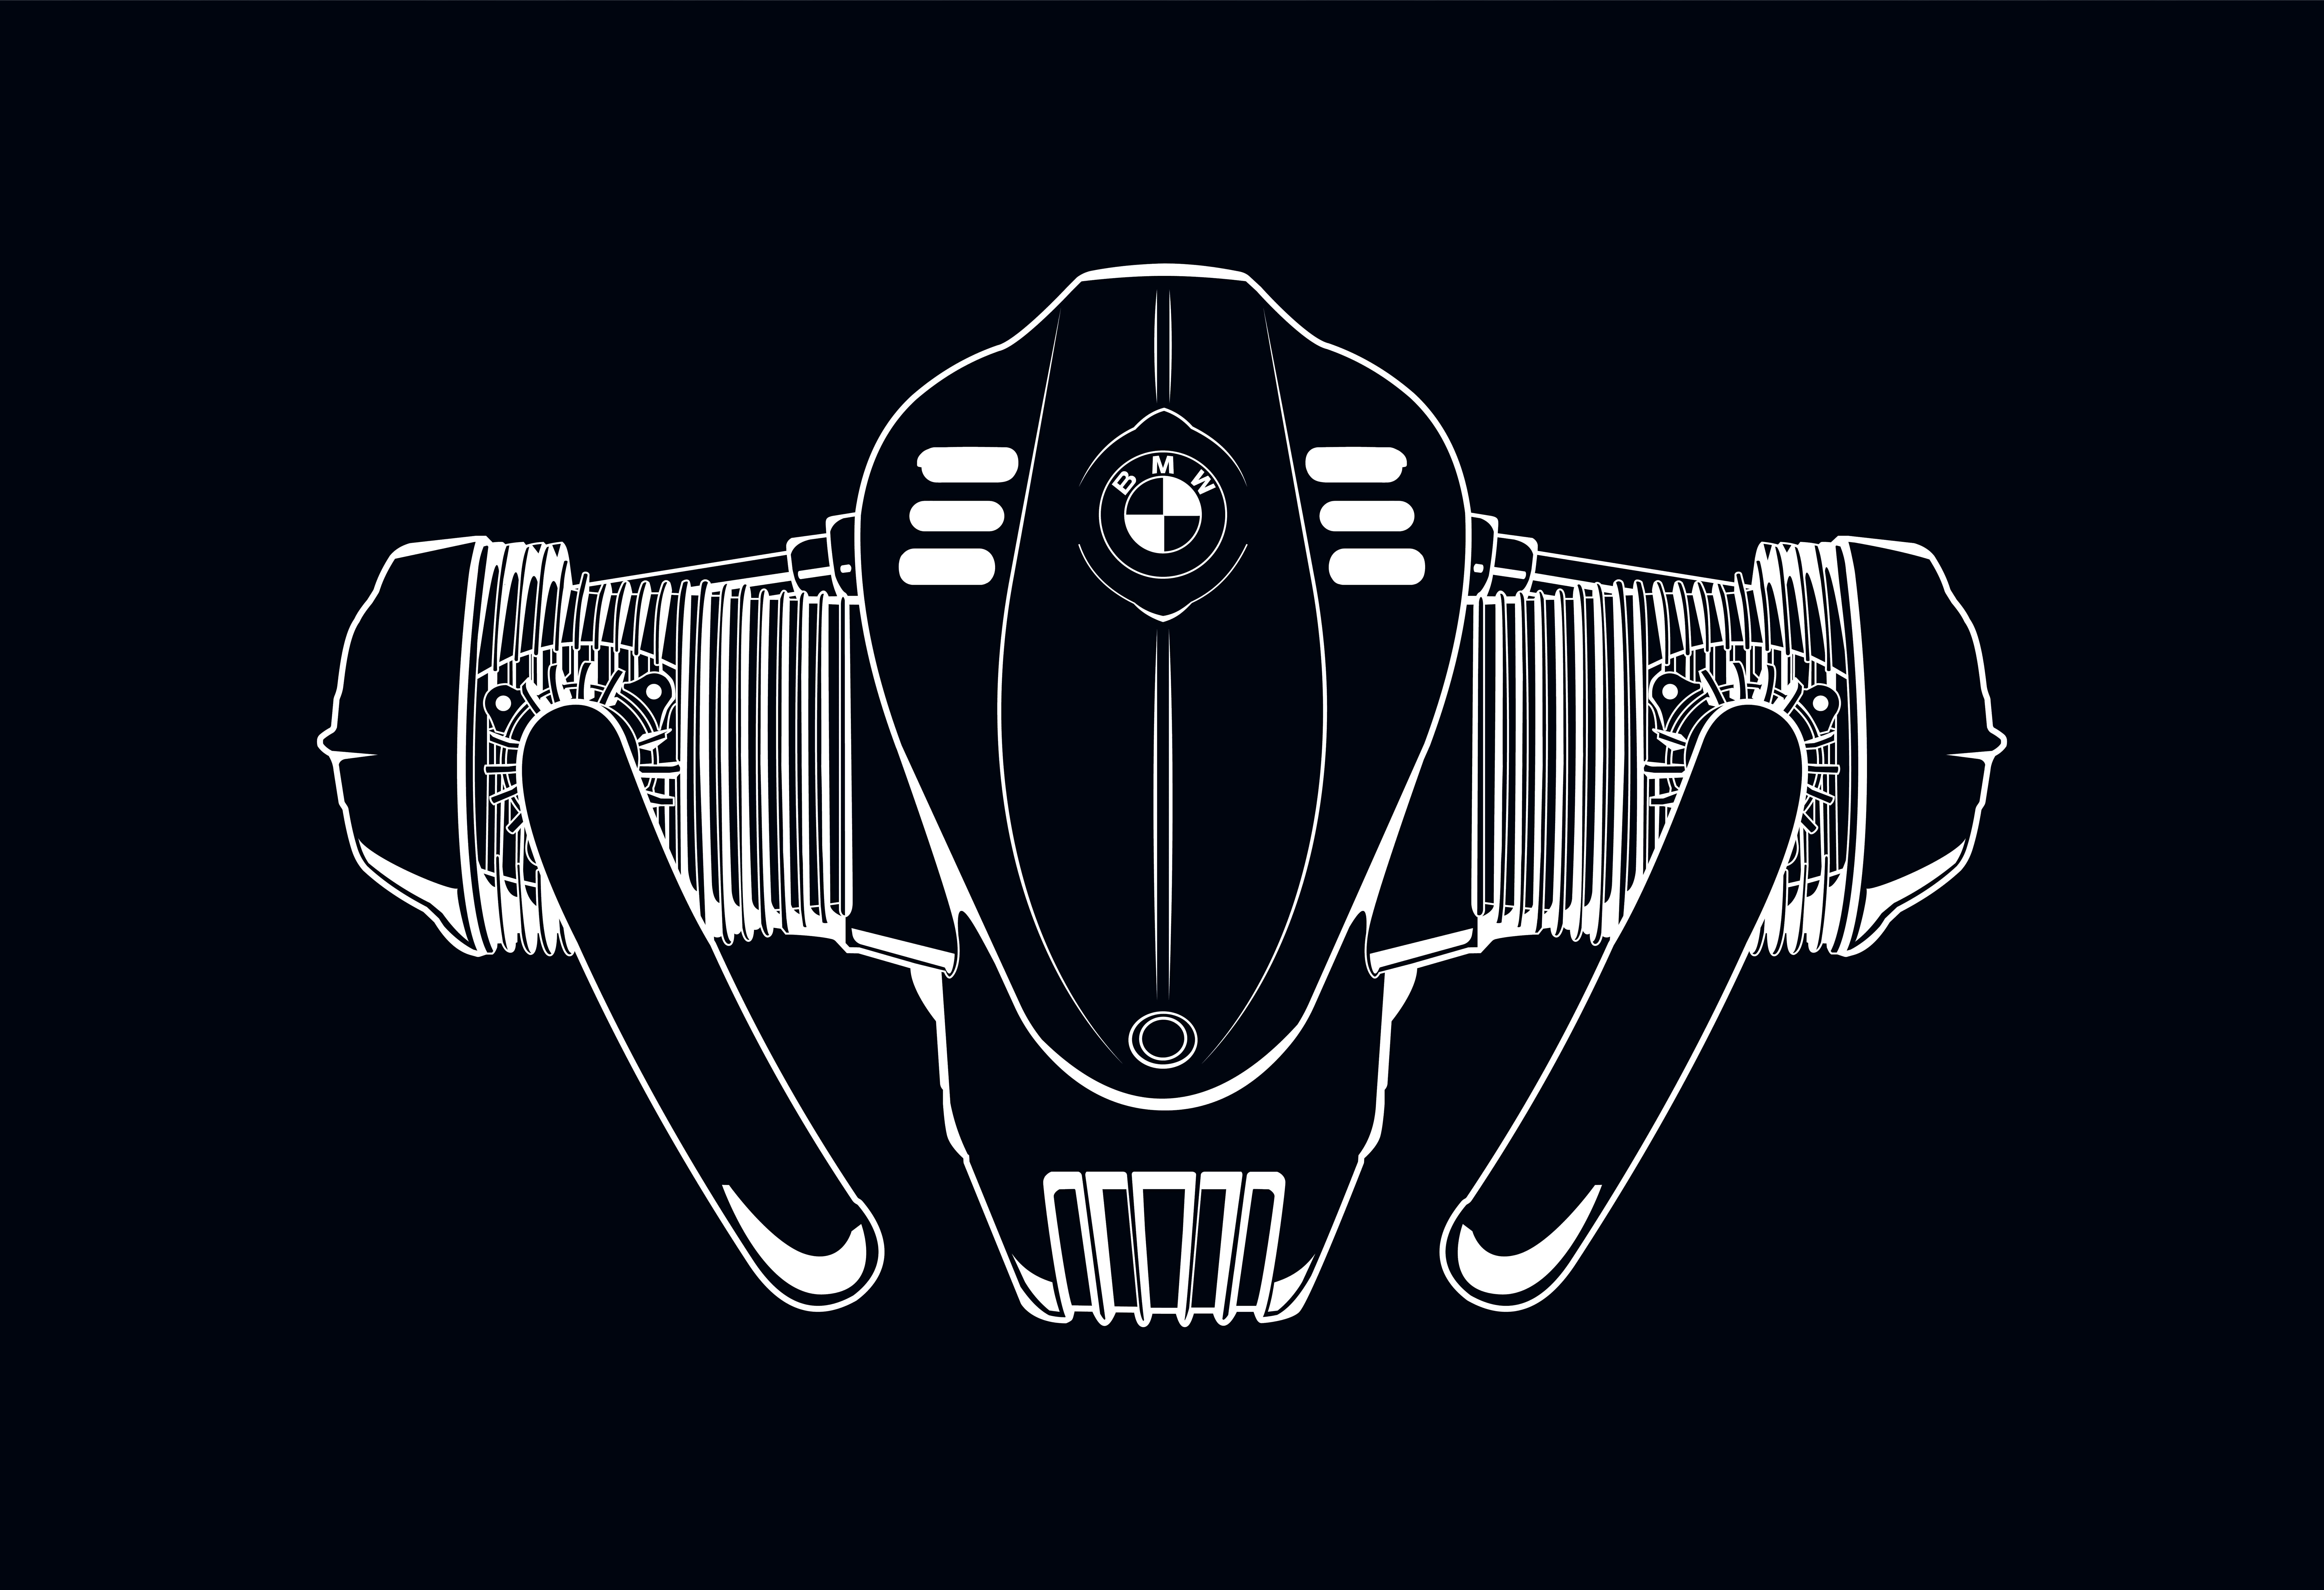 BMWは大排気量水平対向エンジンが最大の特徴となるBMW R 18の量産を発表。